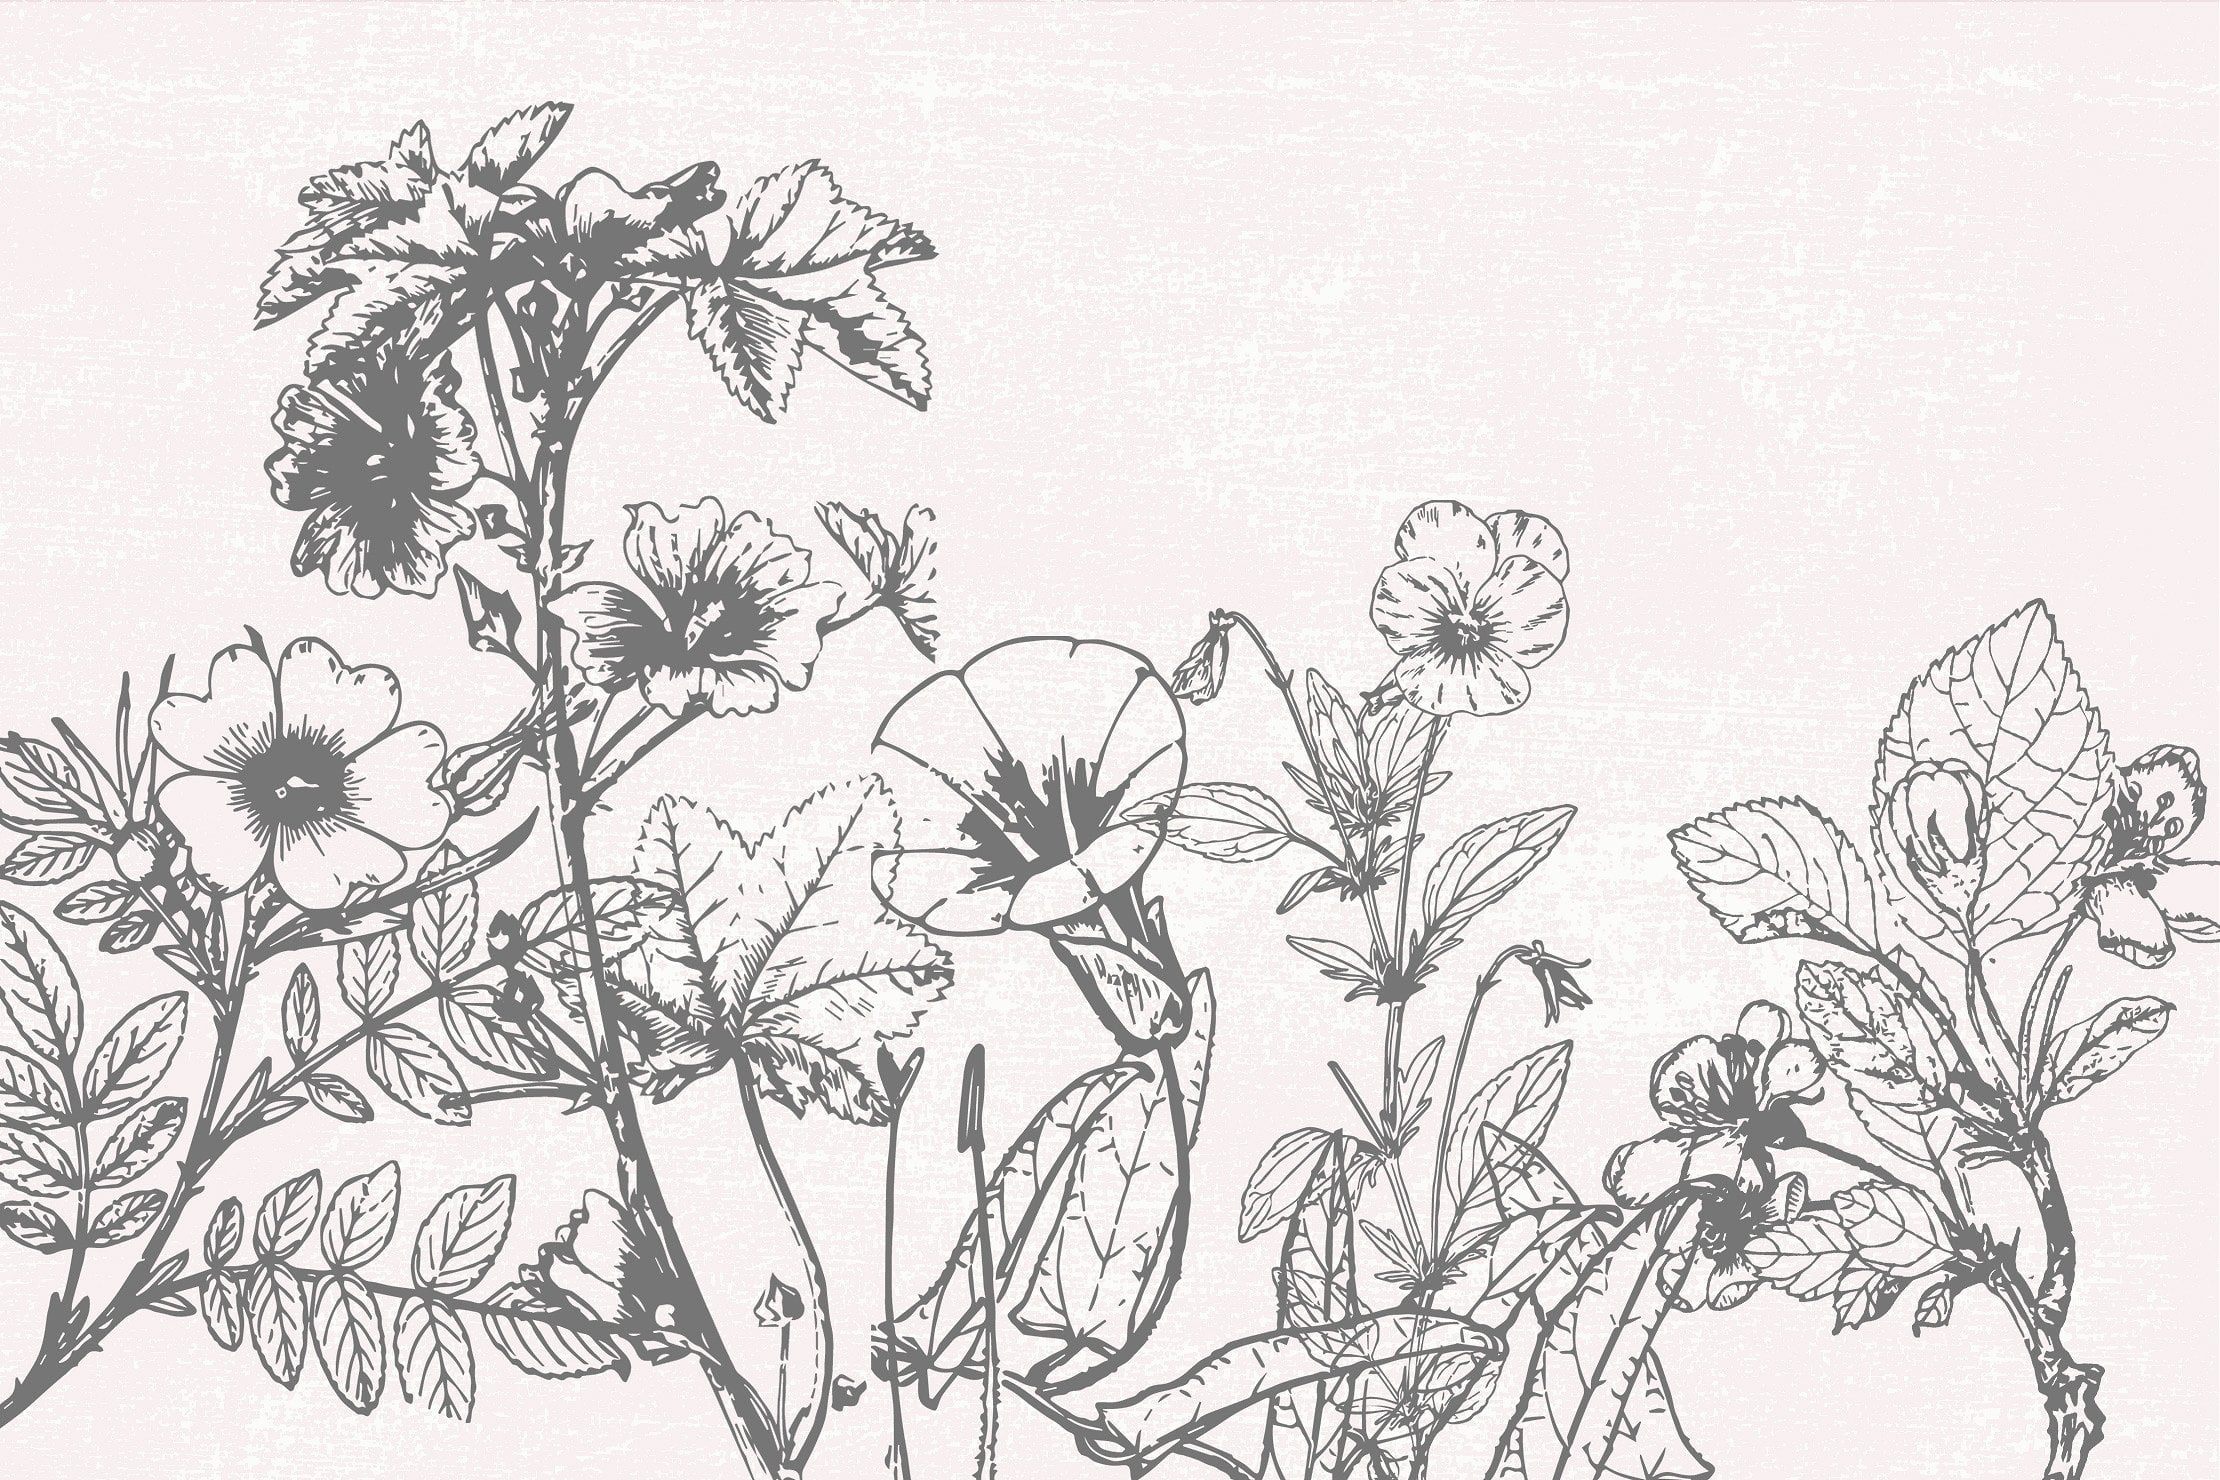 Abundant wildflowers. Beautiful in the simple.